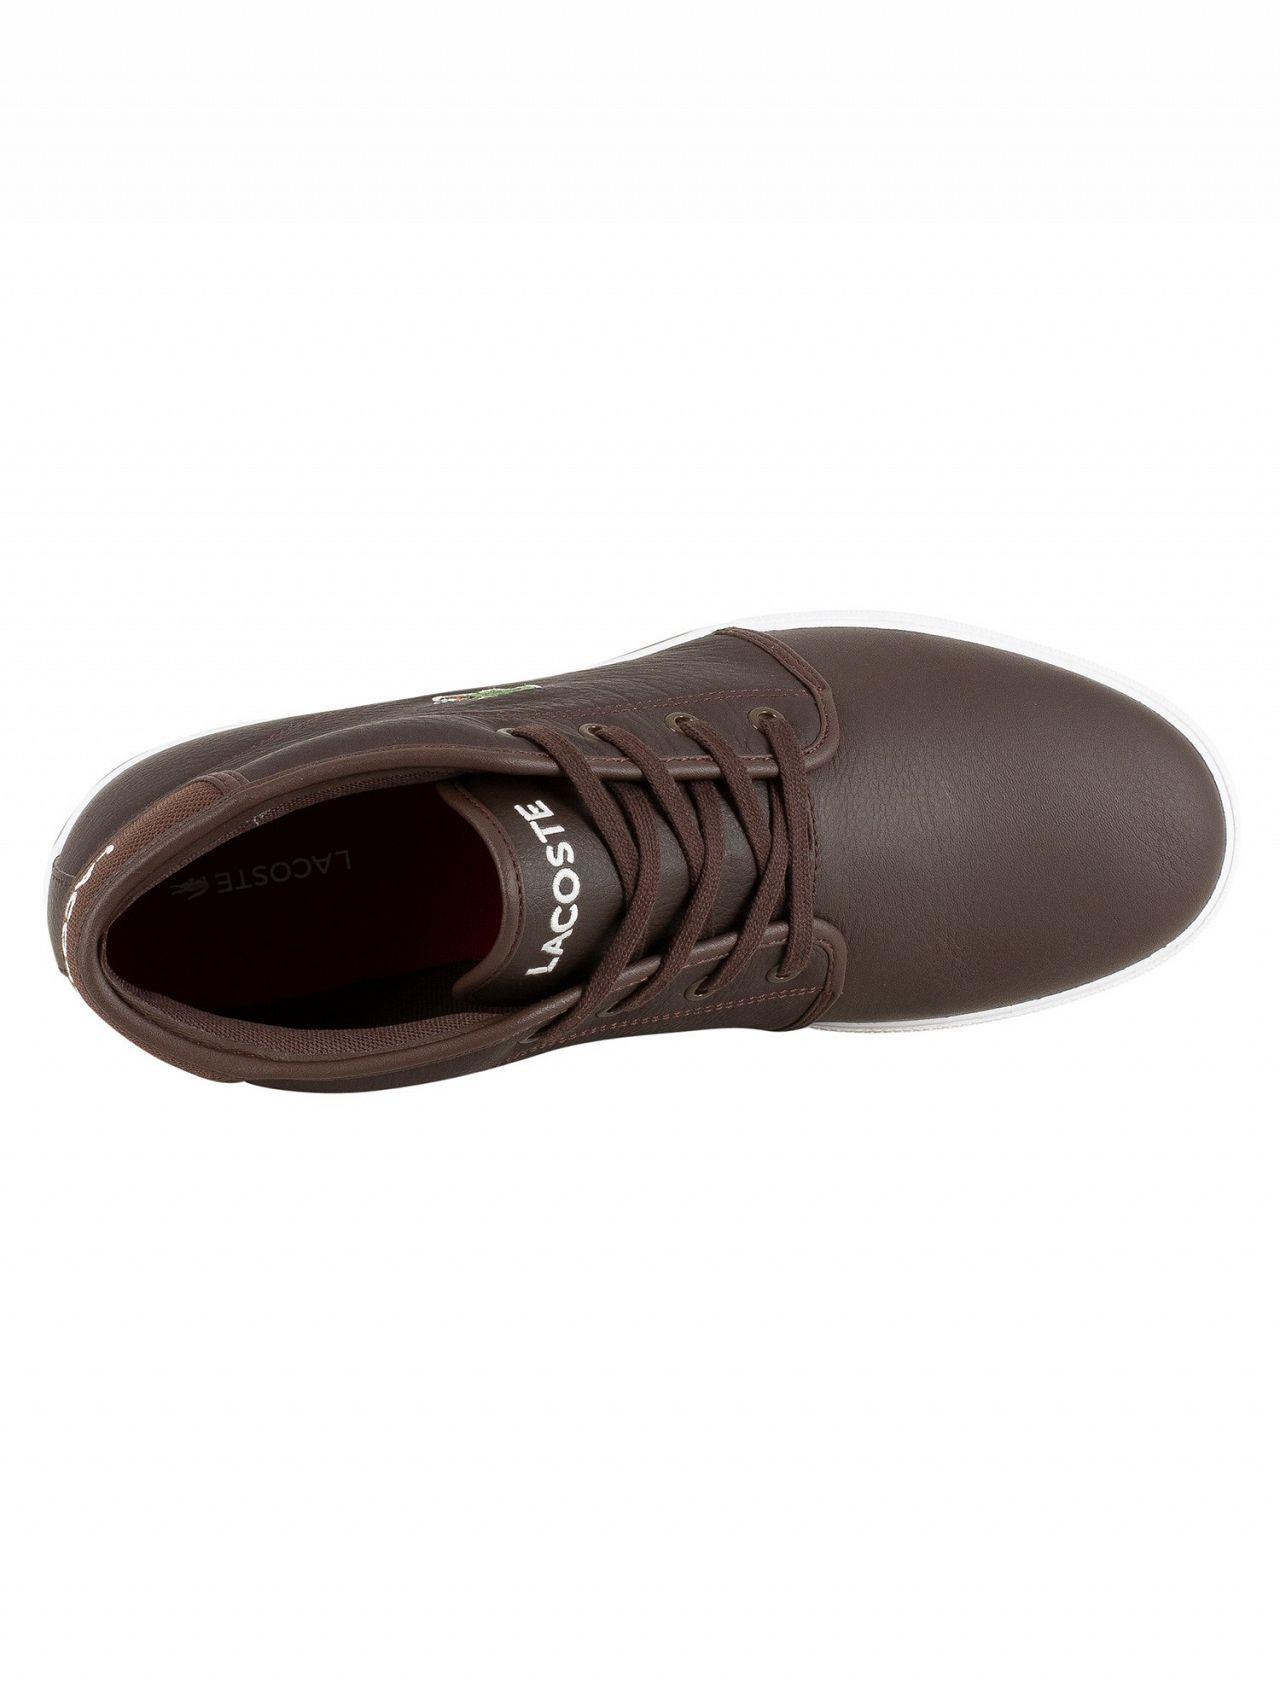 20e4b388d9413e Lacoste Dark Brown Dark Brown Ampthill LCR3 SPM Hi Trainers